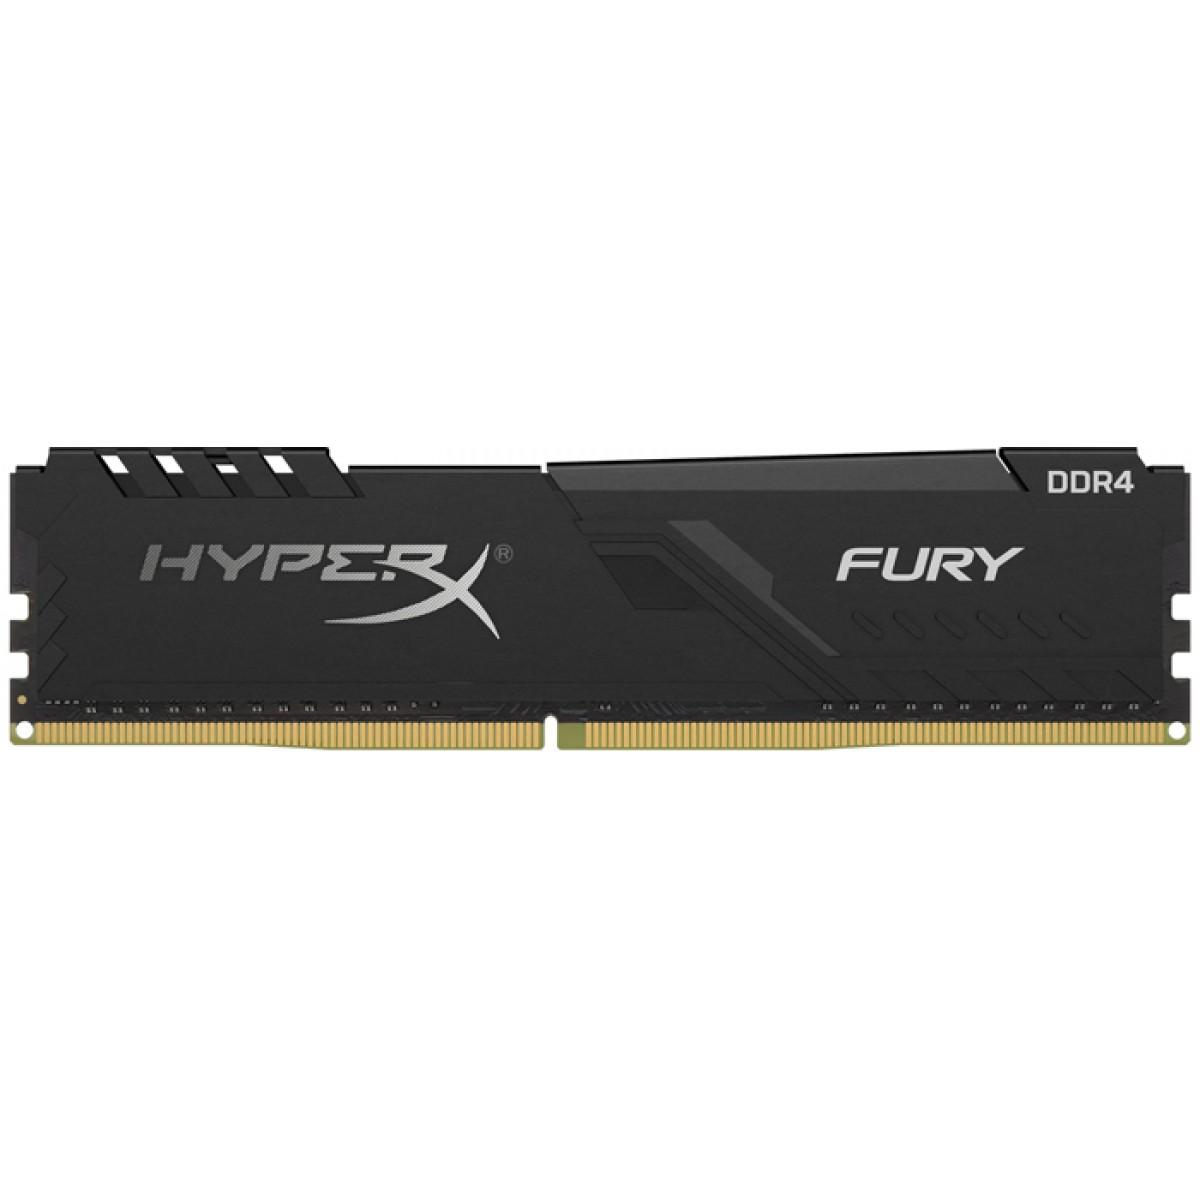 Memória DDR4 Kingston HyperX Fury, 8GB 3466MHz, HX434C16FB3/8